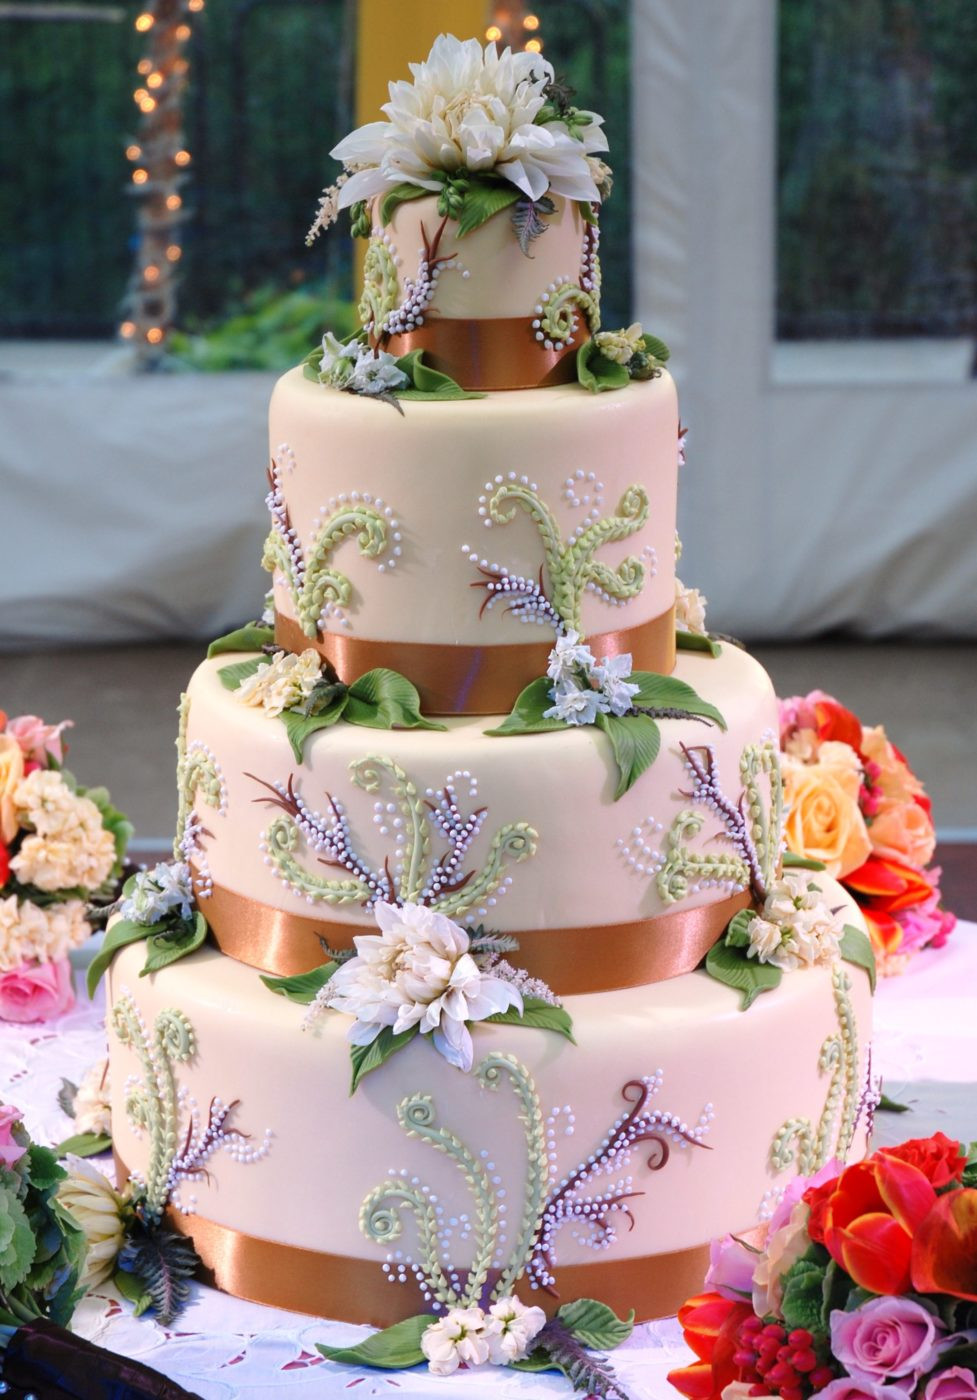 Cool Wedding Cakes  Unique Wedding Cakes